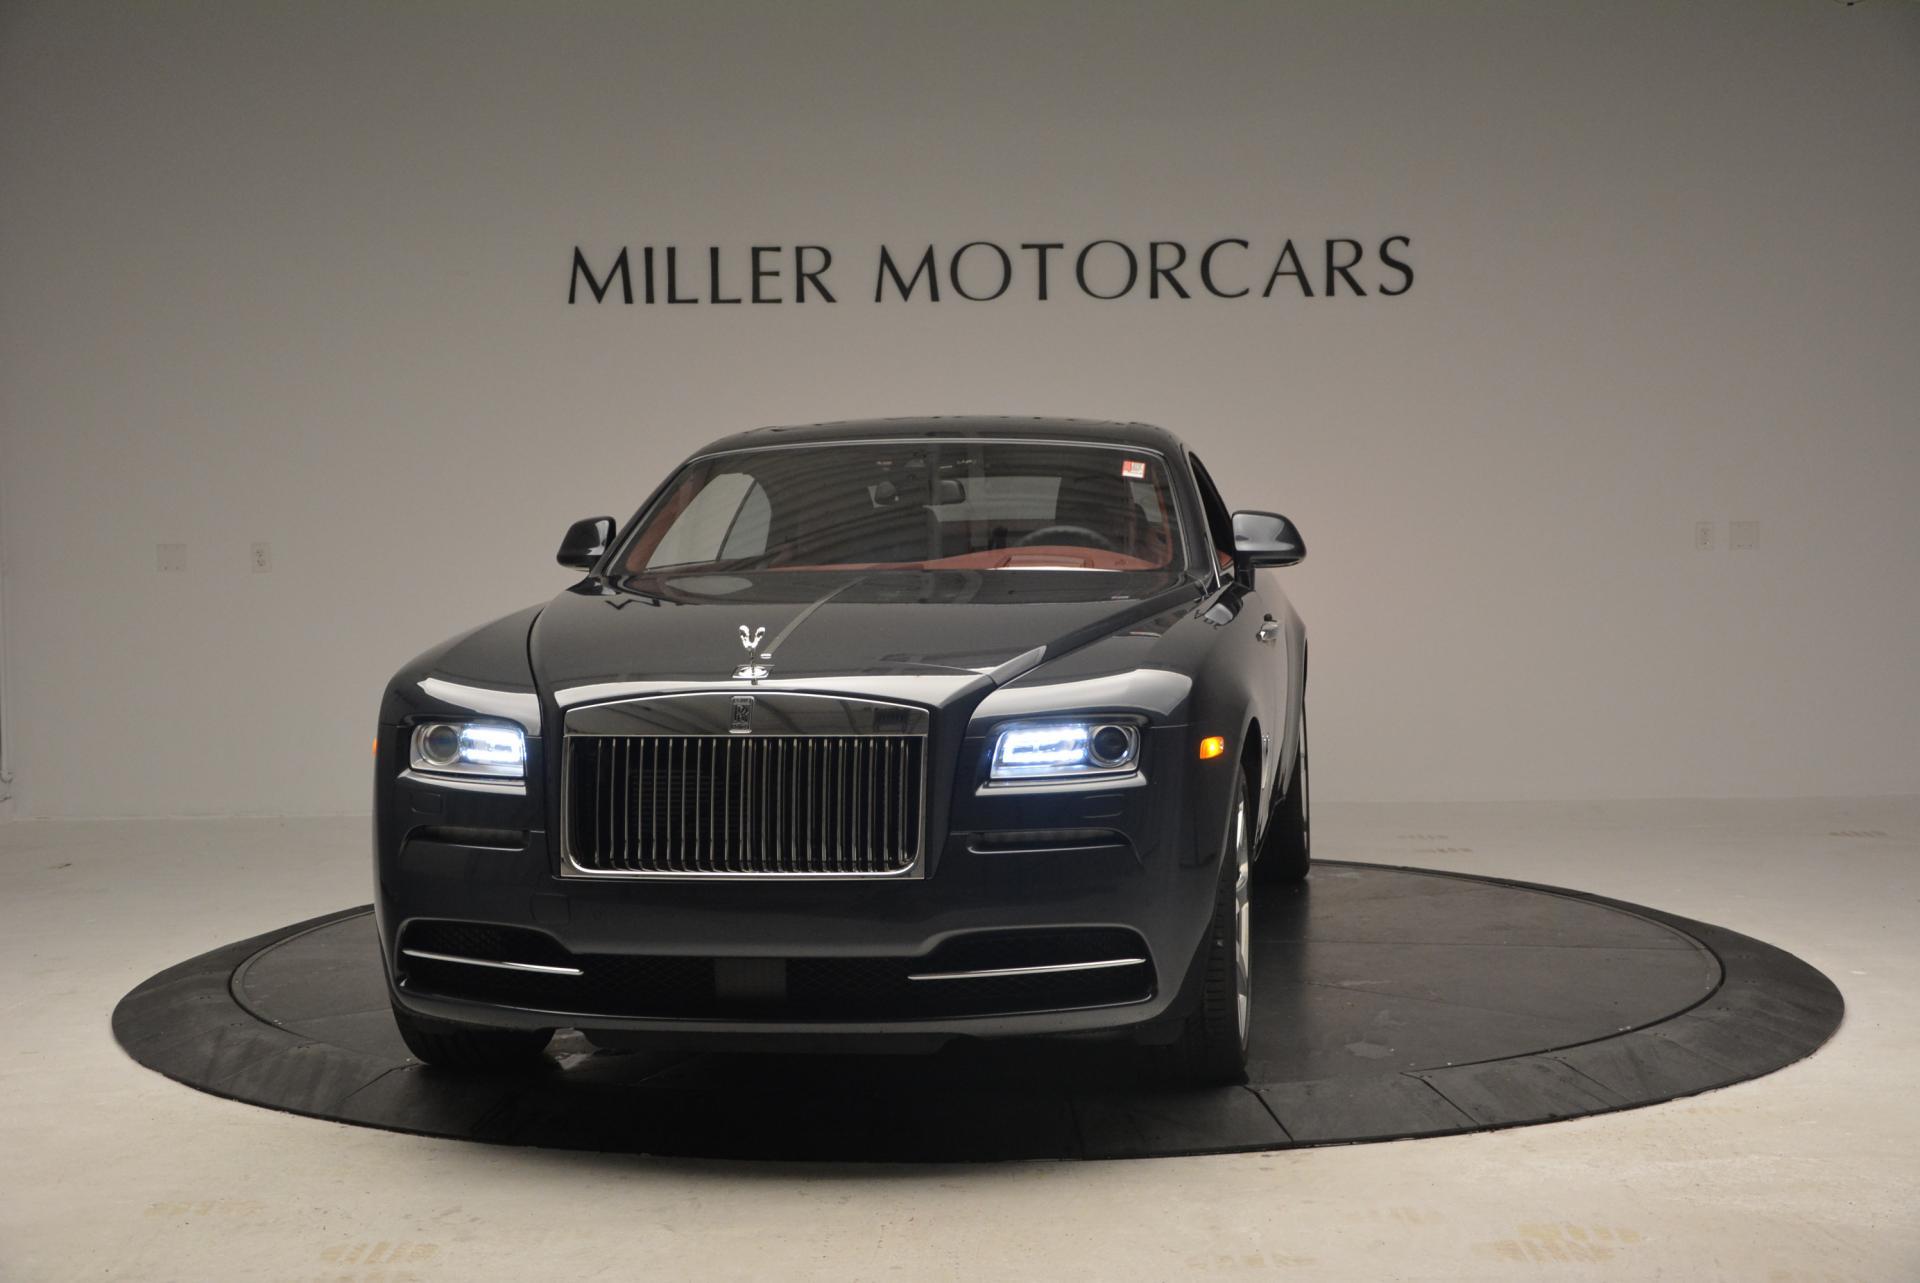 Used 2016 Rolls-Royce Wraith for sale Sold at Alfa Romeo of Westport in Westport CT 06880 1